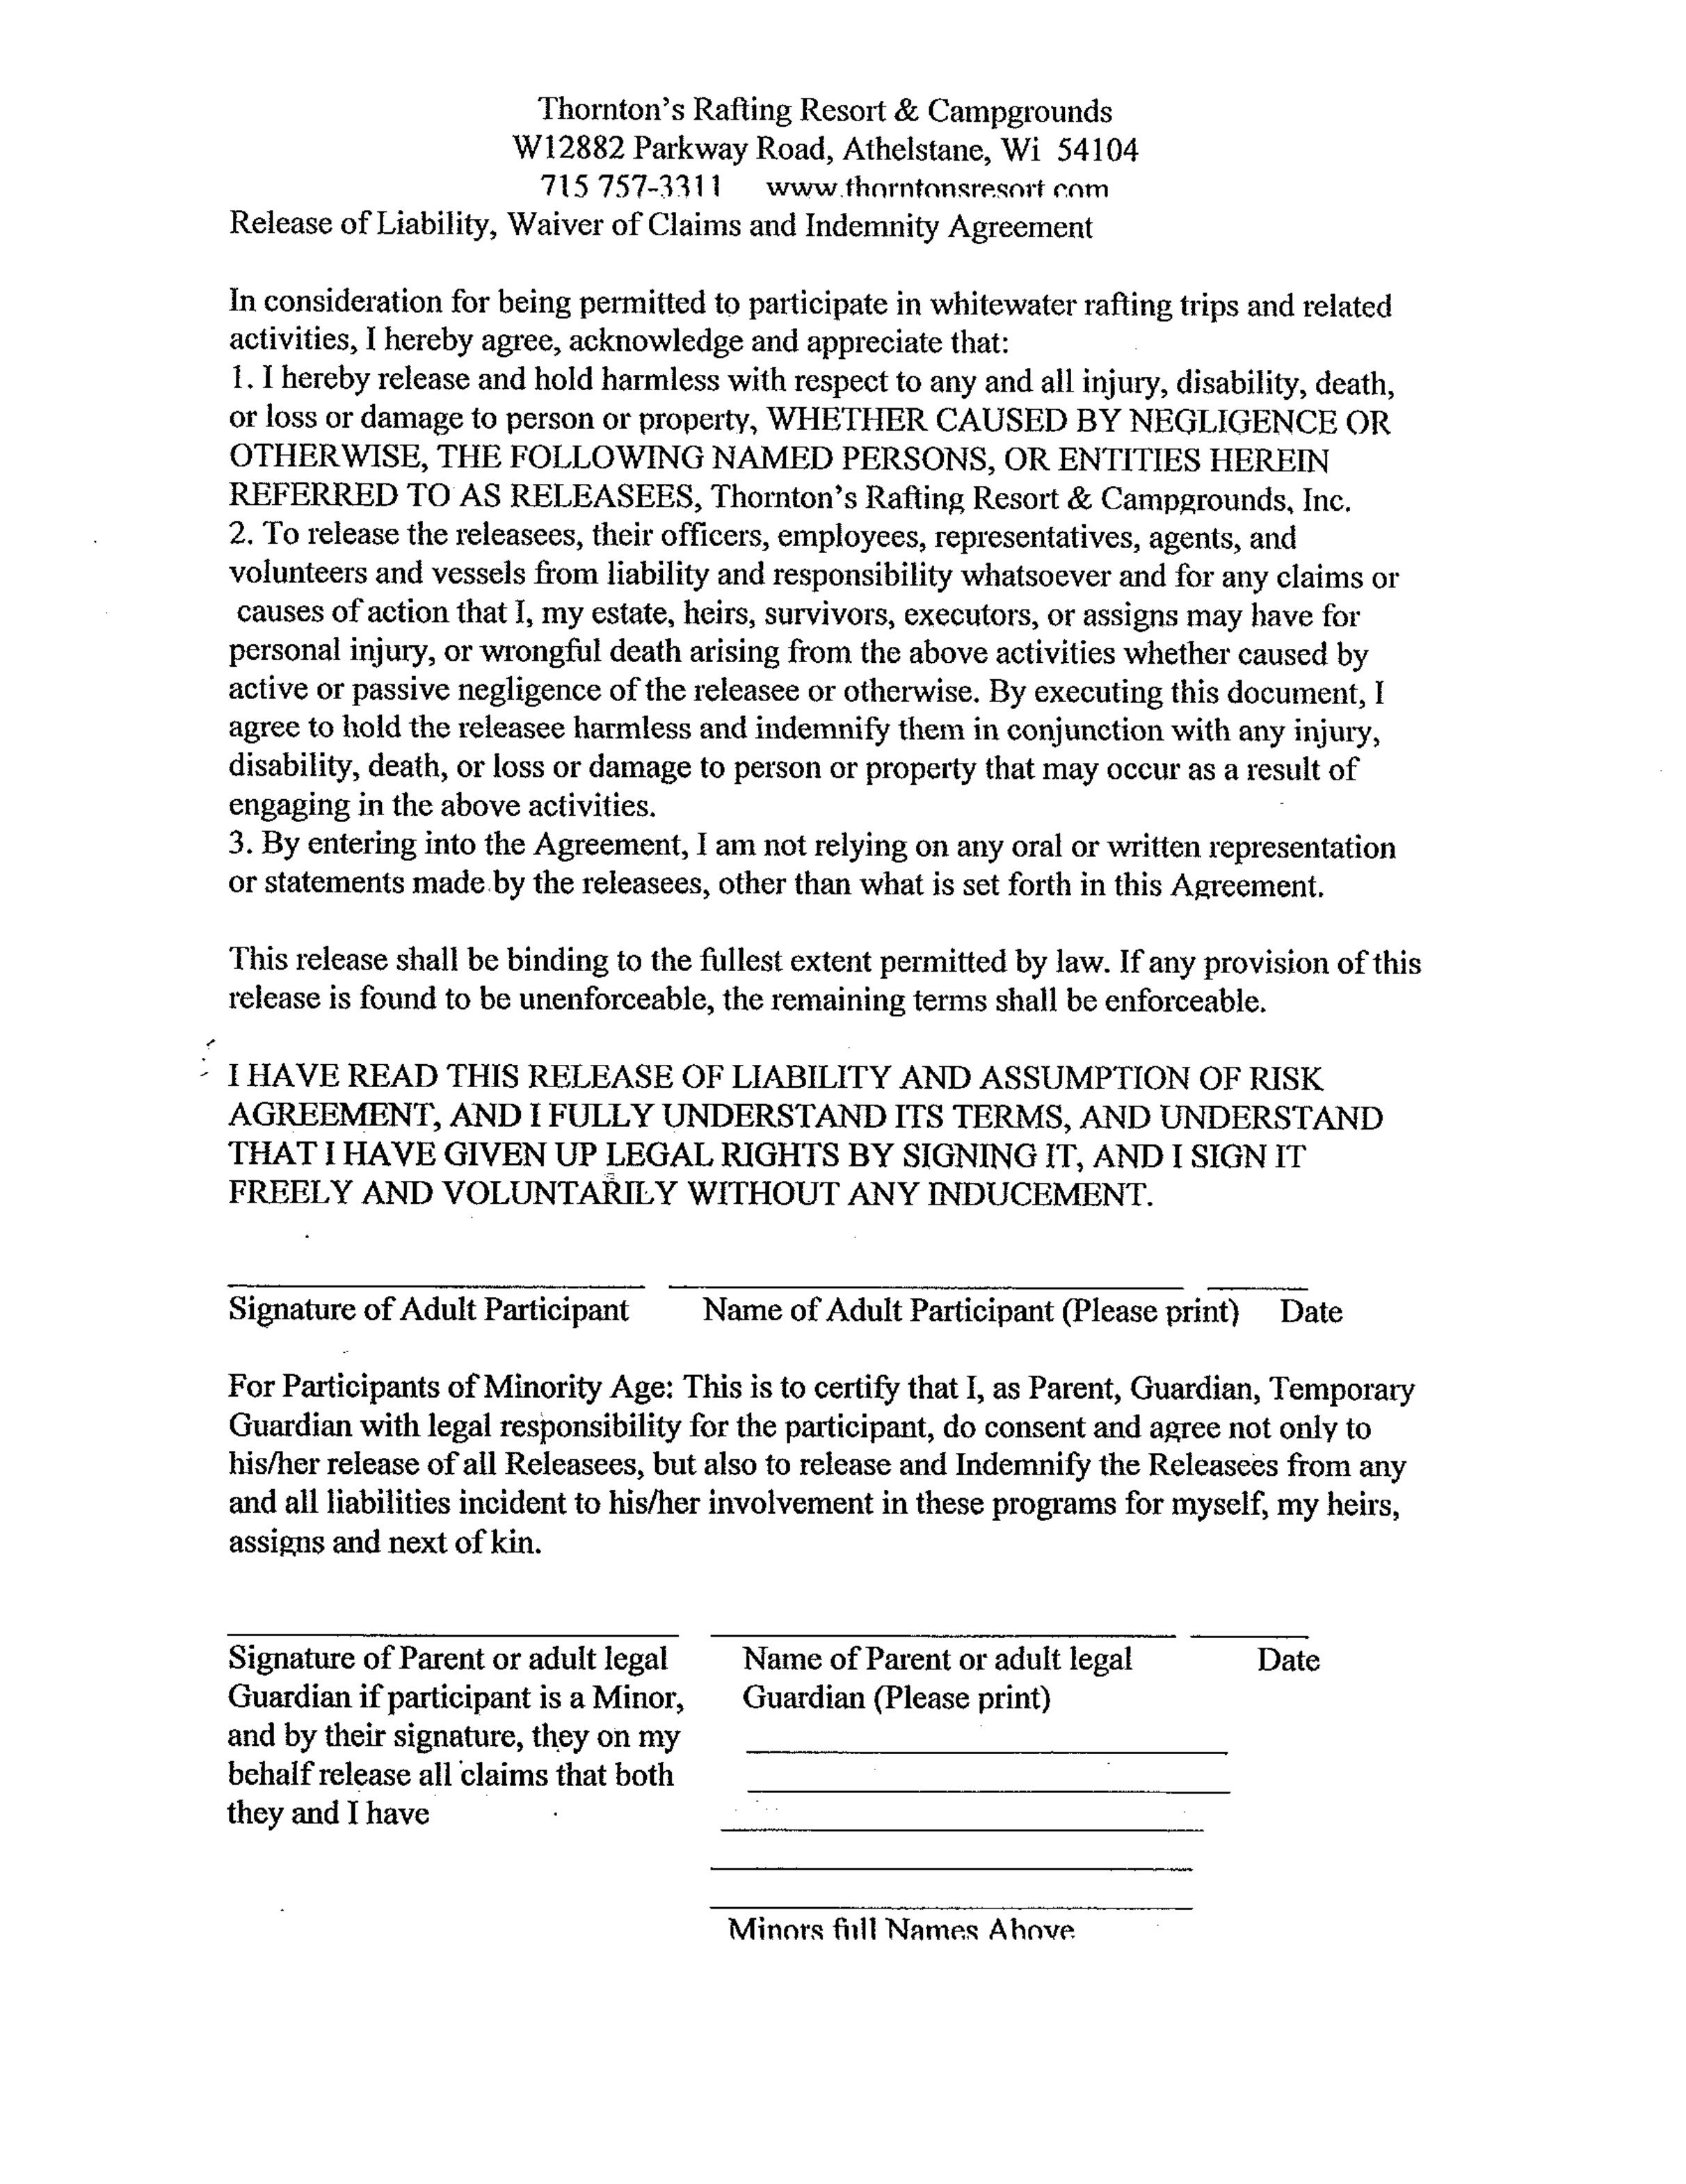 004 Singular Liability Release Form Template Image  Free GeneralFull